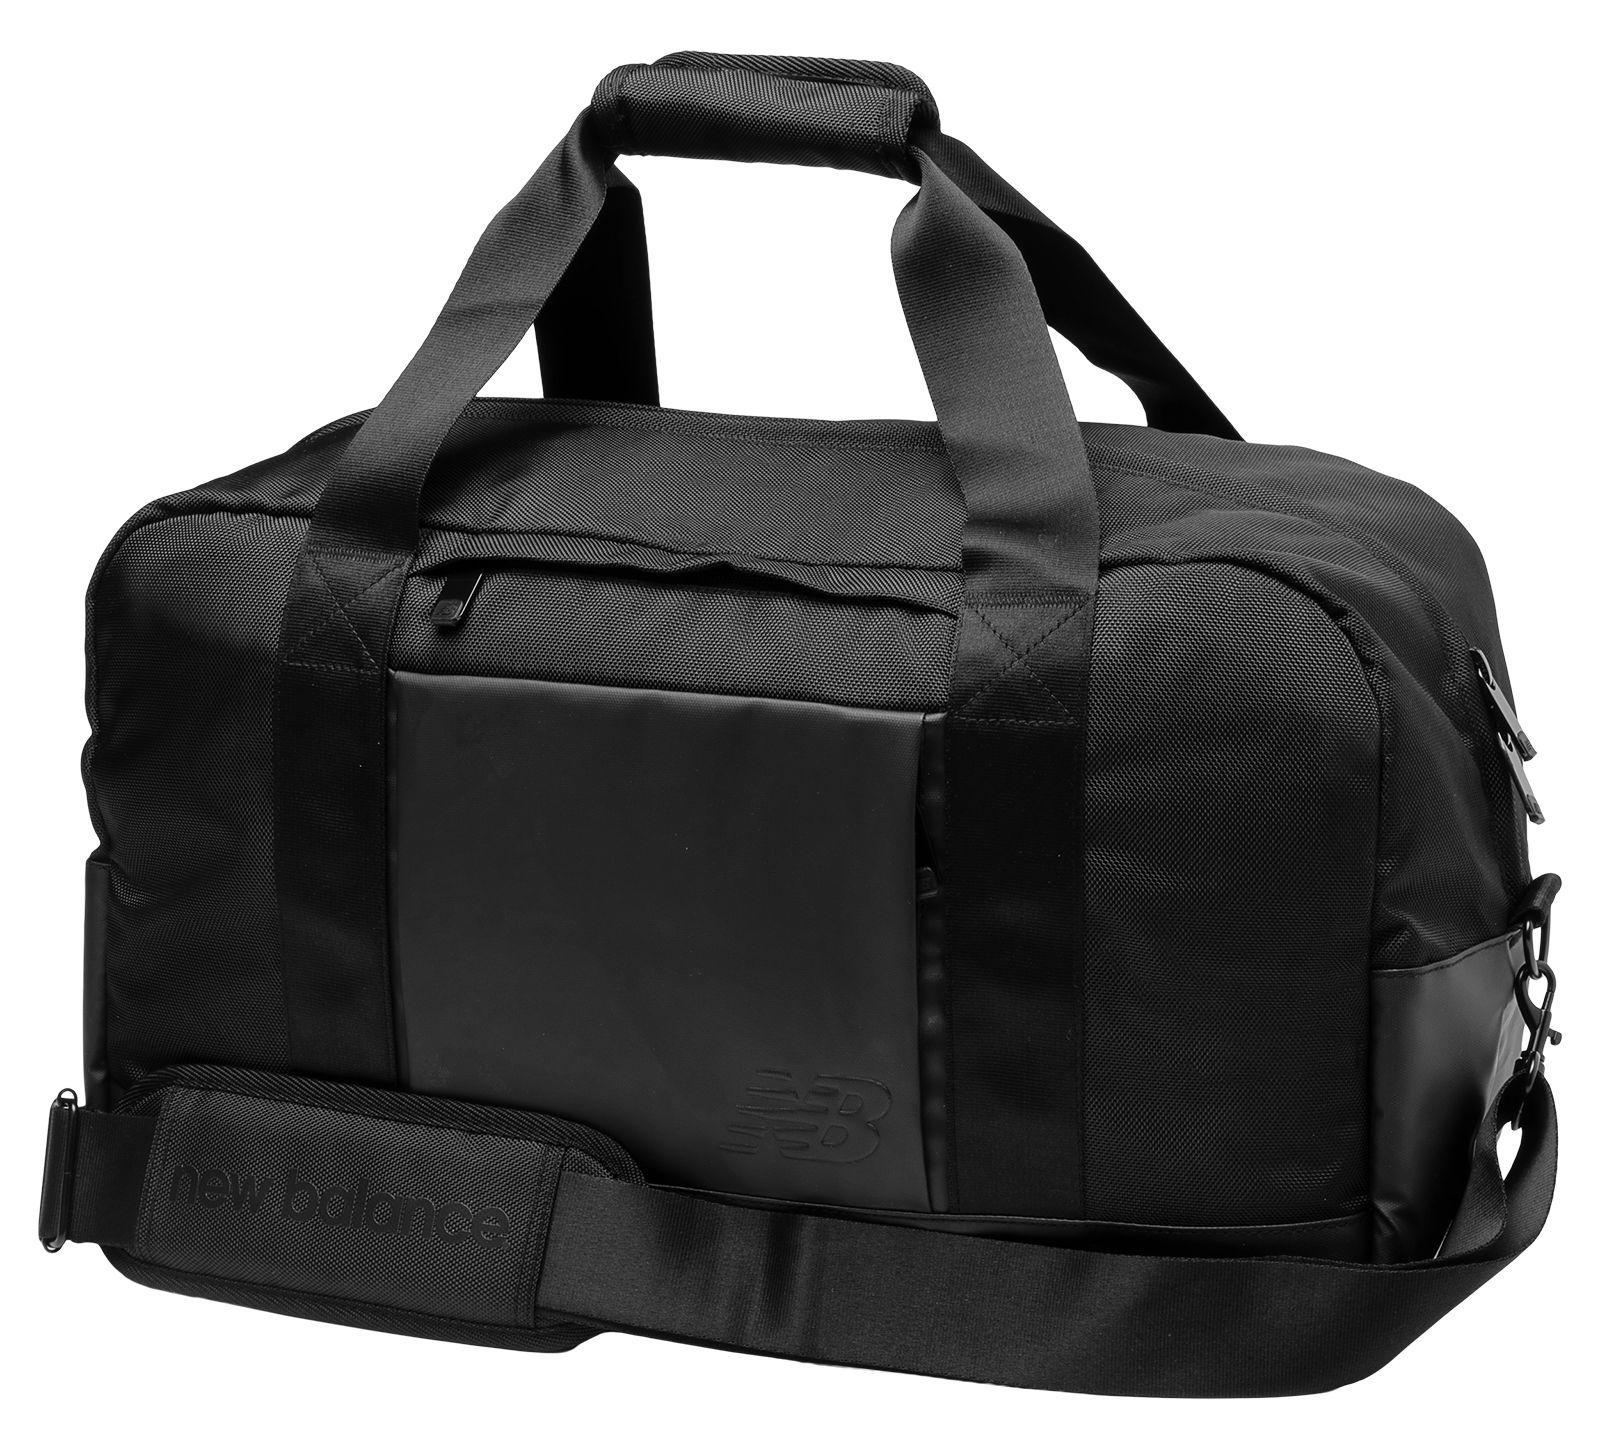 Lyst - New Balance Omni Duffel Bag in Black for Men f9f2030aa1139